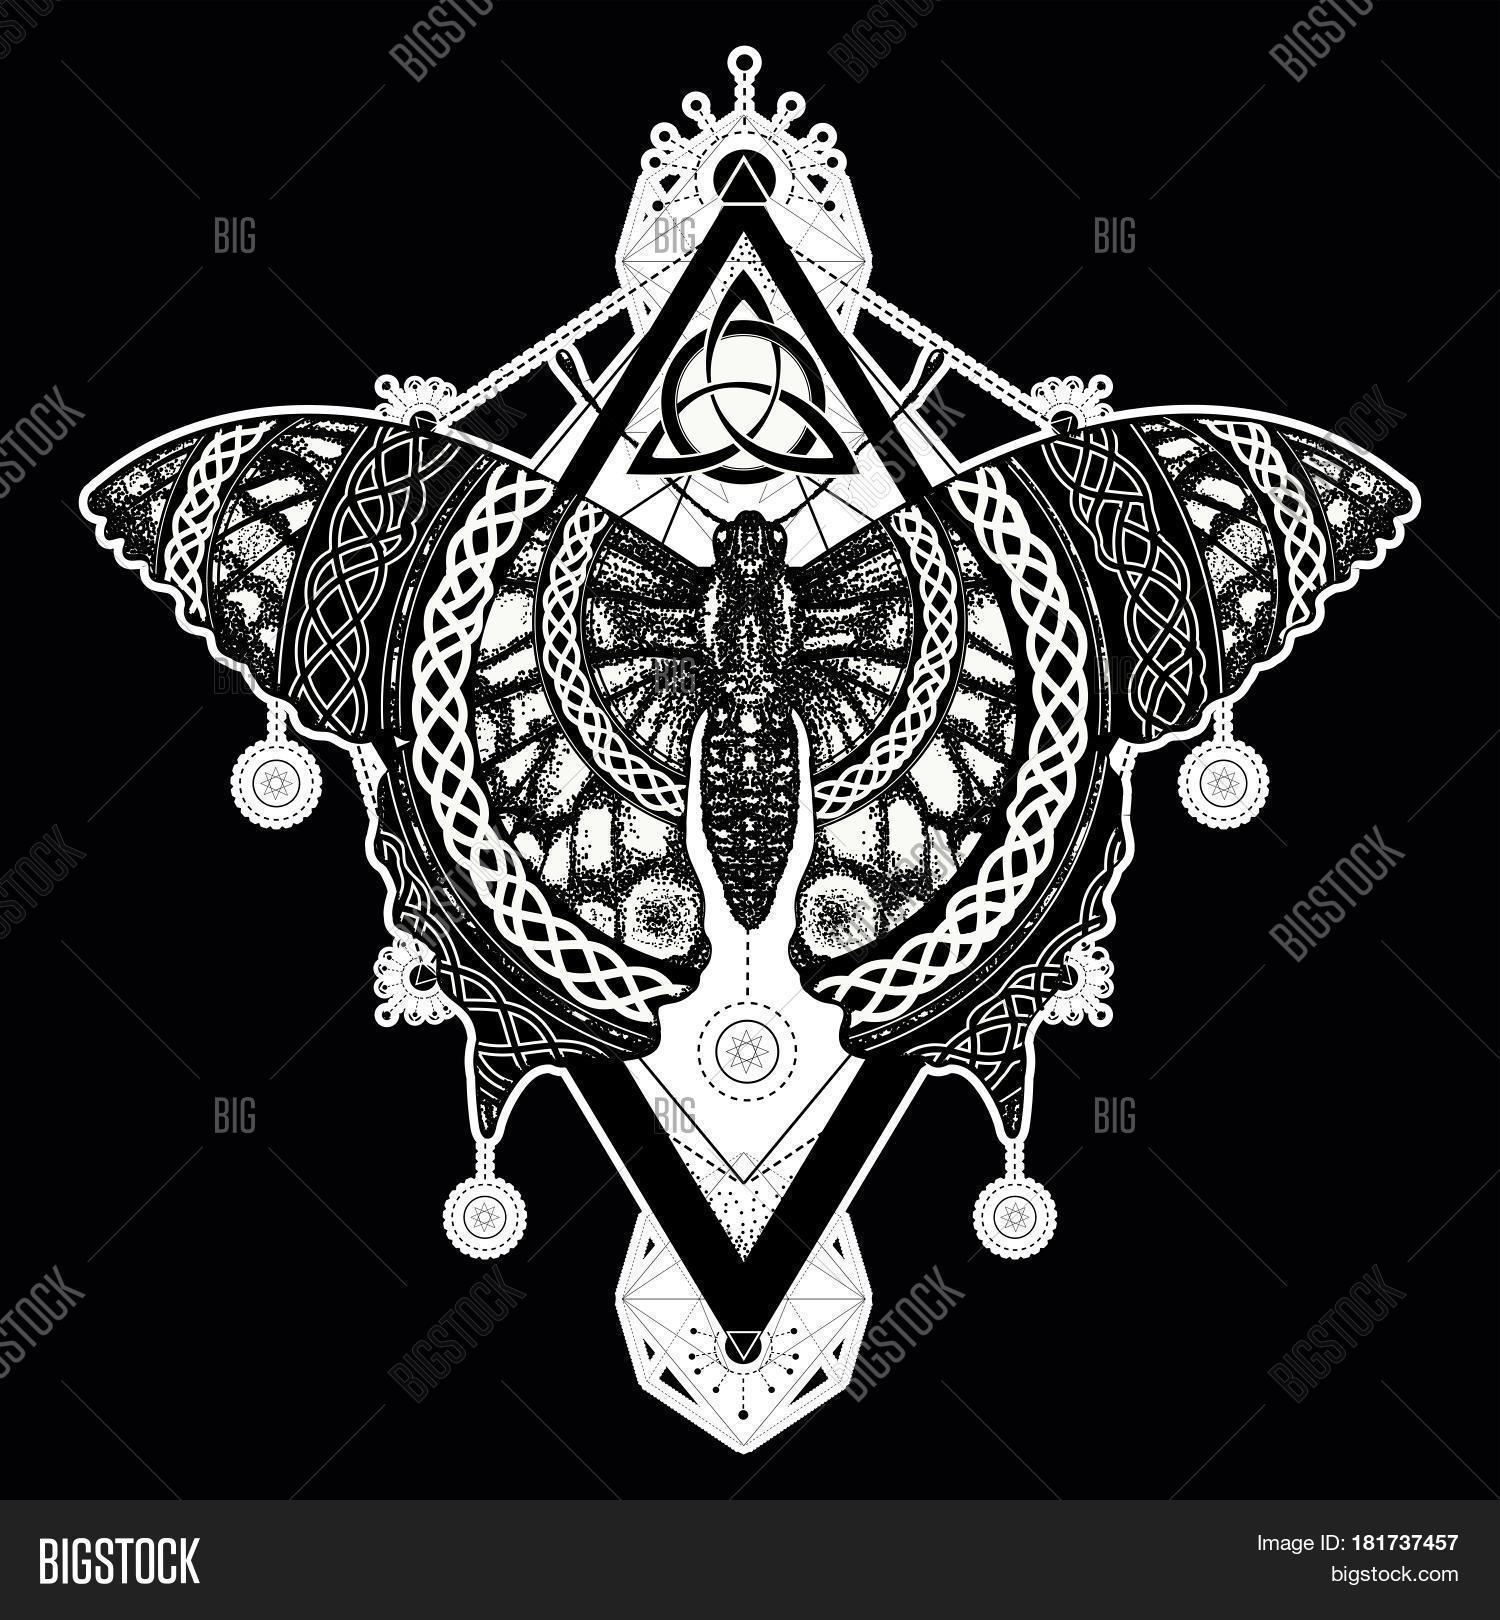 47f41111e Butterfly tattoo art celtic style. Mystical symbol of freedom nature  tourism. Beautiful Swallowtail boho